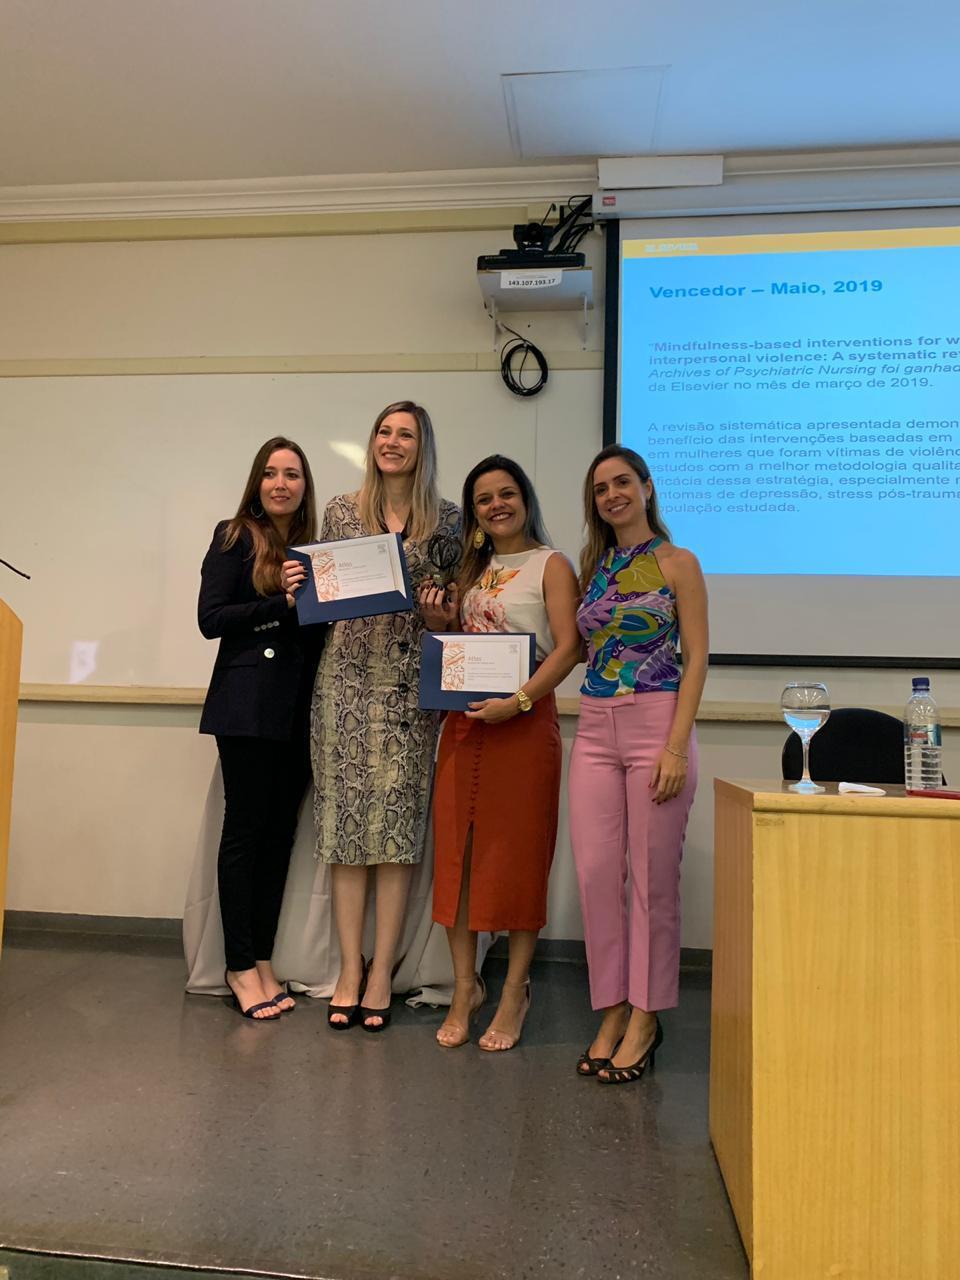 Thais Vick (Elsevier), Edilaine Cristina da Silva Gherardi-Donato , Larissa Horta Esper, Christiane Fiorin (Elsevier)